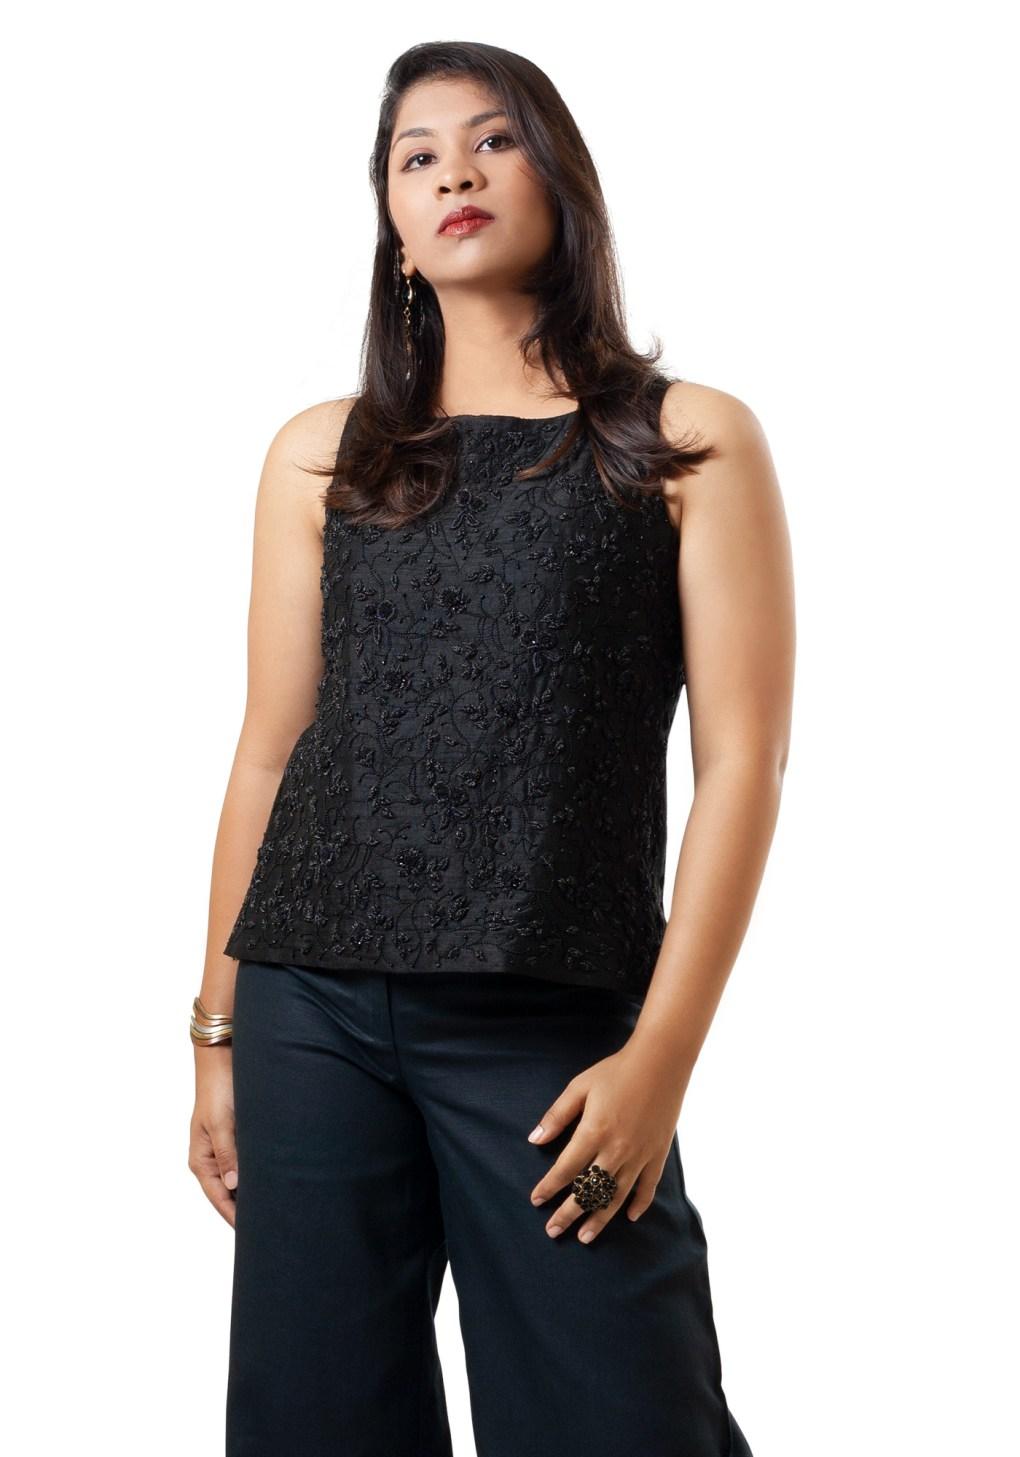 MINC ecofashion Sleeveless Hand Embroidered Black Beaded Top in Black Silk